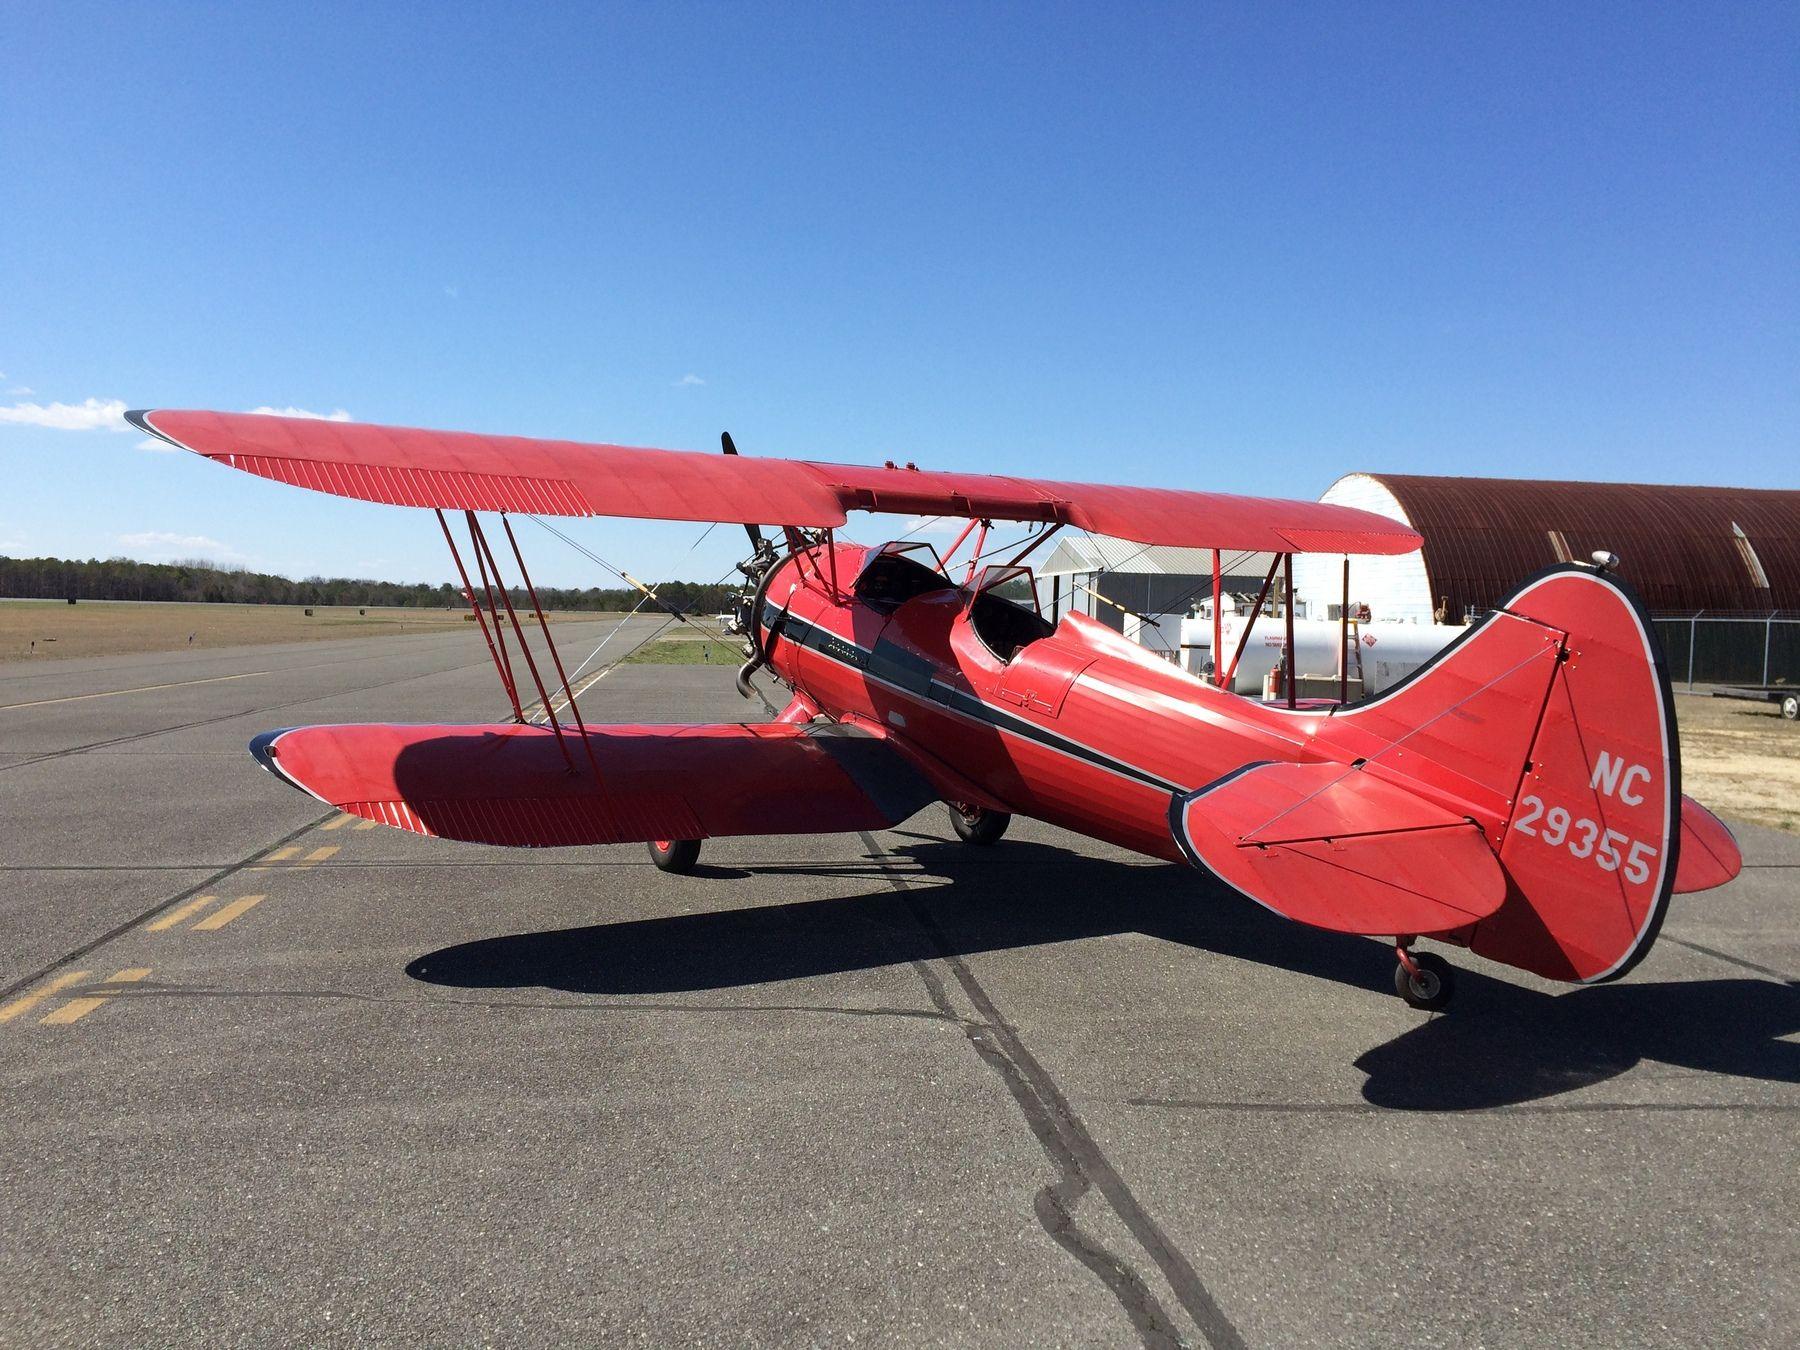 1940 Waco UPF-7 for sale in (KOBI) Woodbine, NJ USA => http://www.airplanemart.com/aircraft-for-sale/Single-Engine-Piston/1940-Waco-UPF-7/10254/